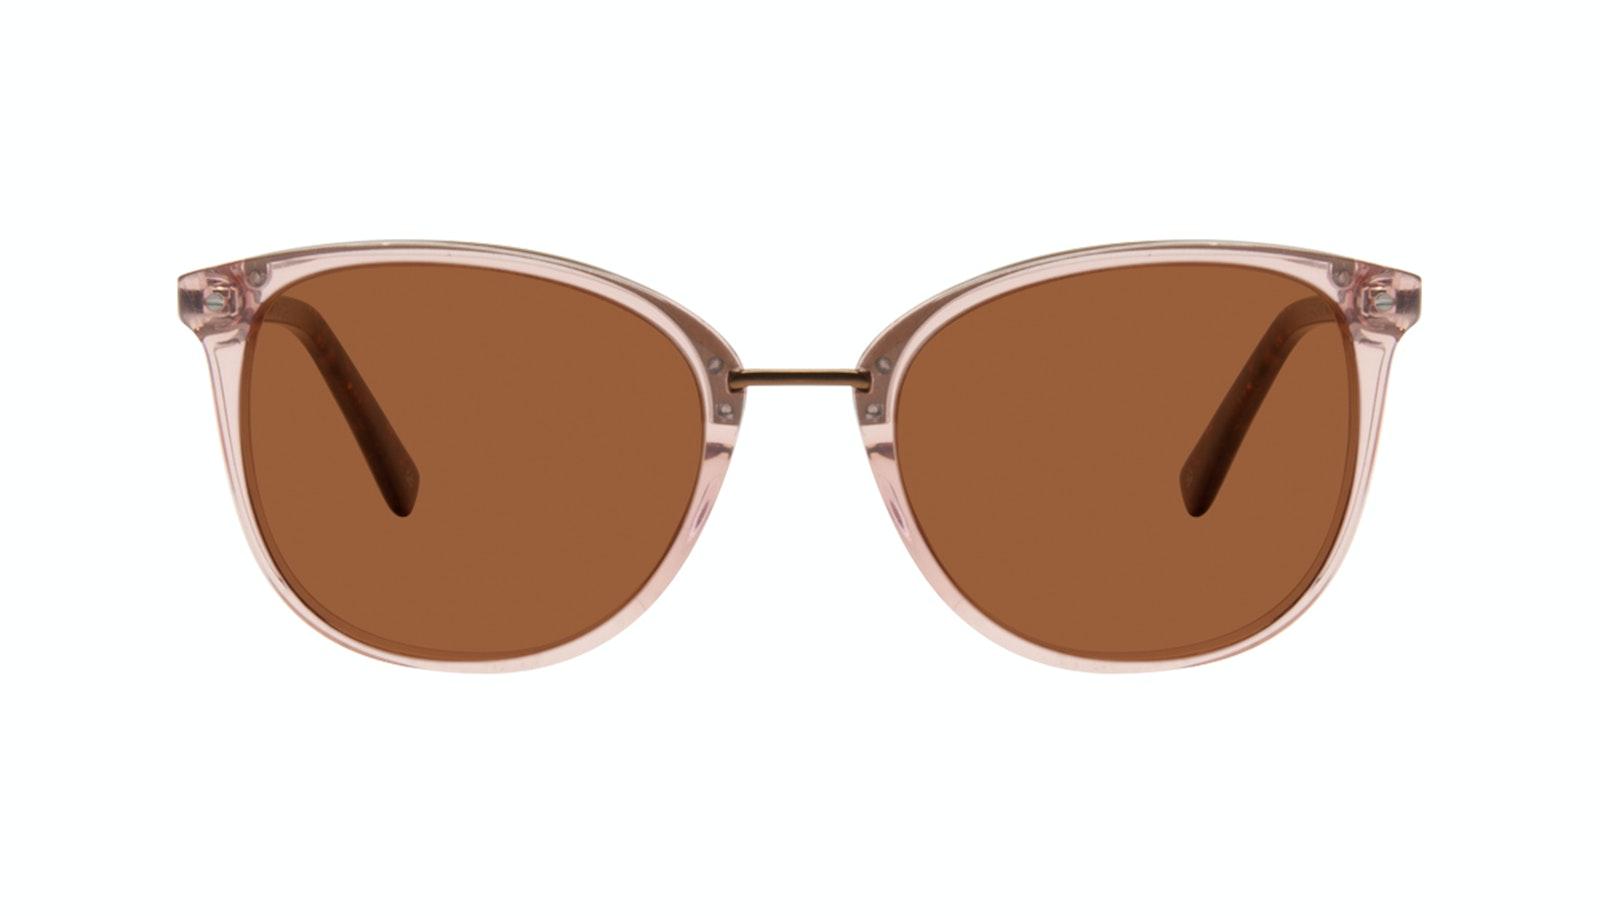 Affordable Fashion Glasses Square Round Sunglasses Women Bella Rose